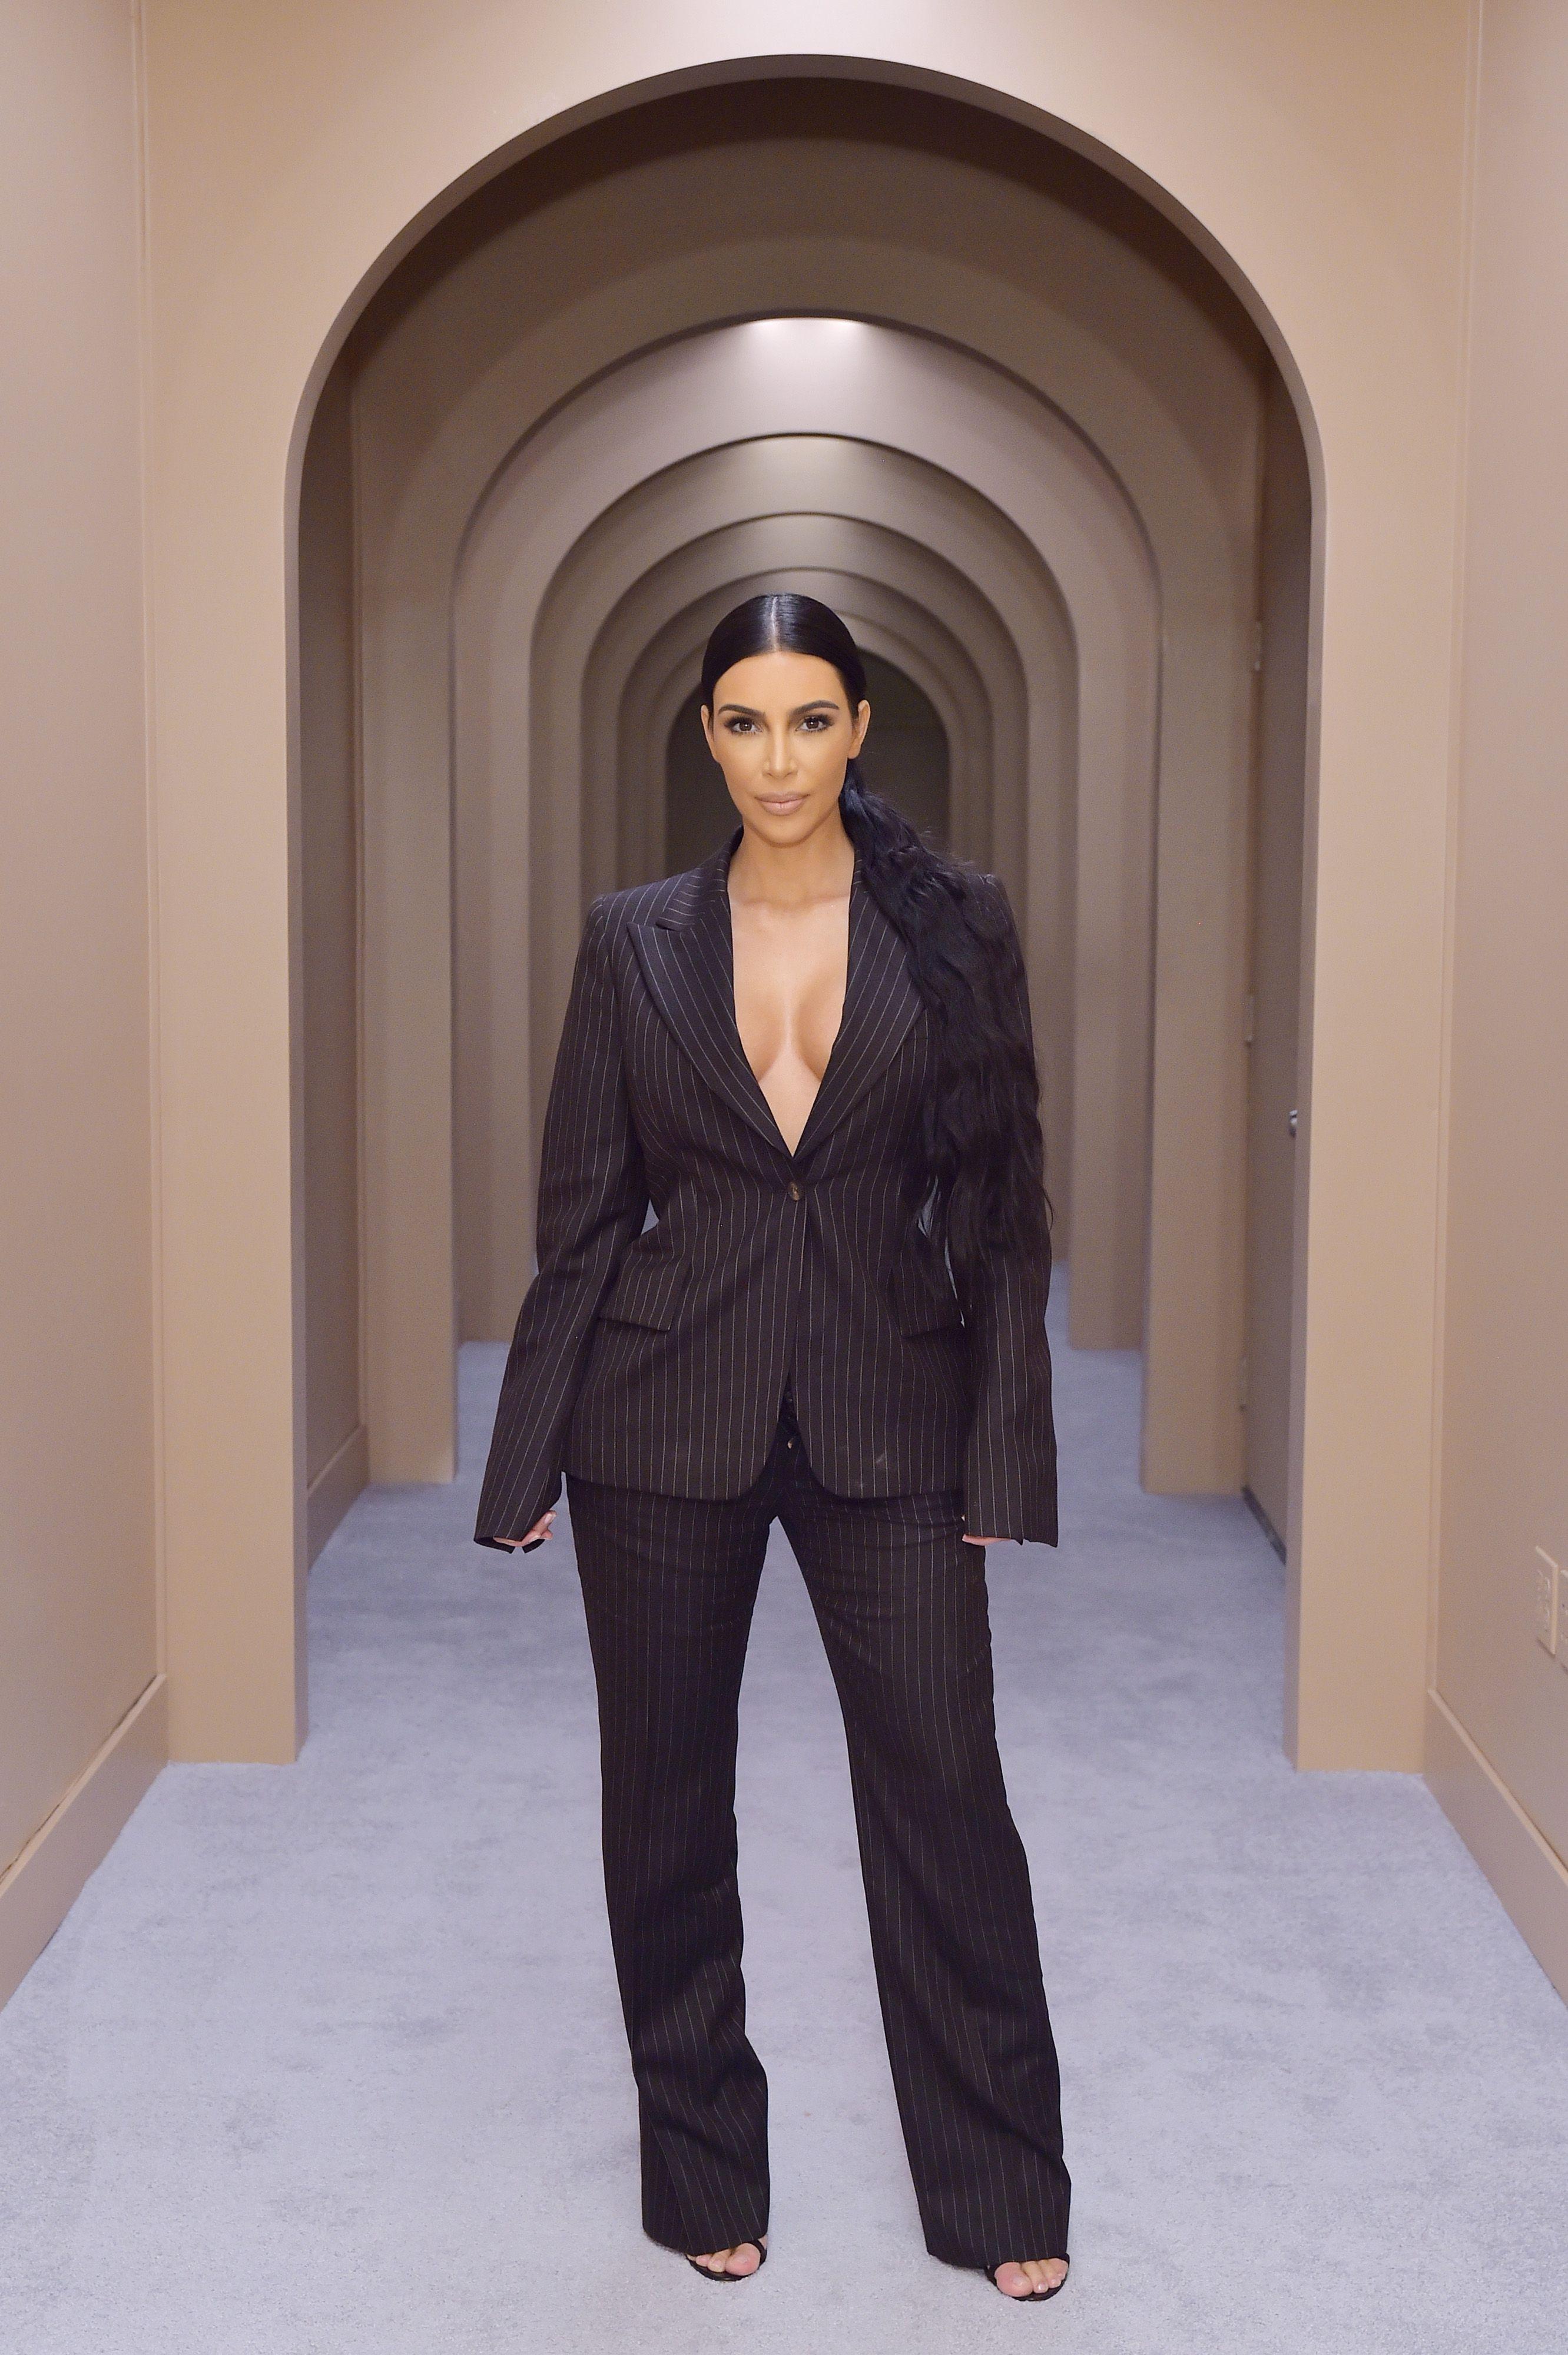 tour kim kardashian s bathroom in her